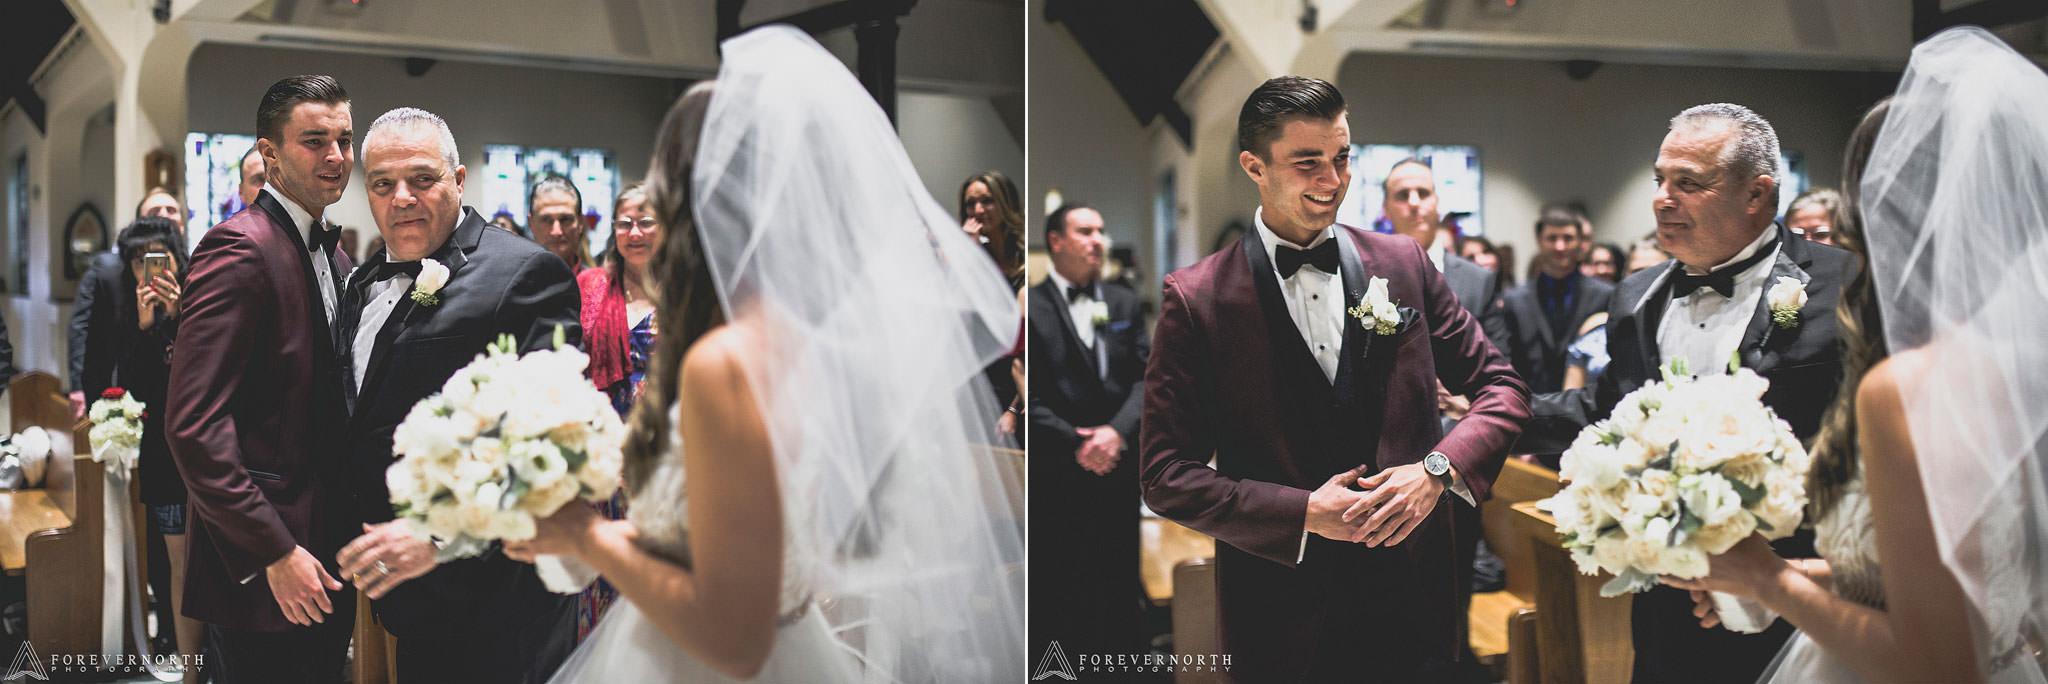 Bergersen-Bethpage-Wedding-Photographer-36.JPG